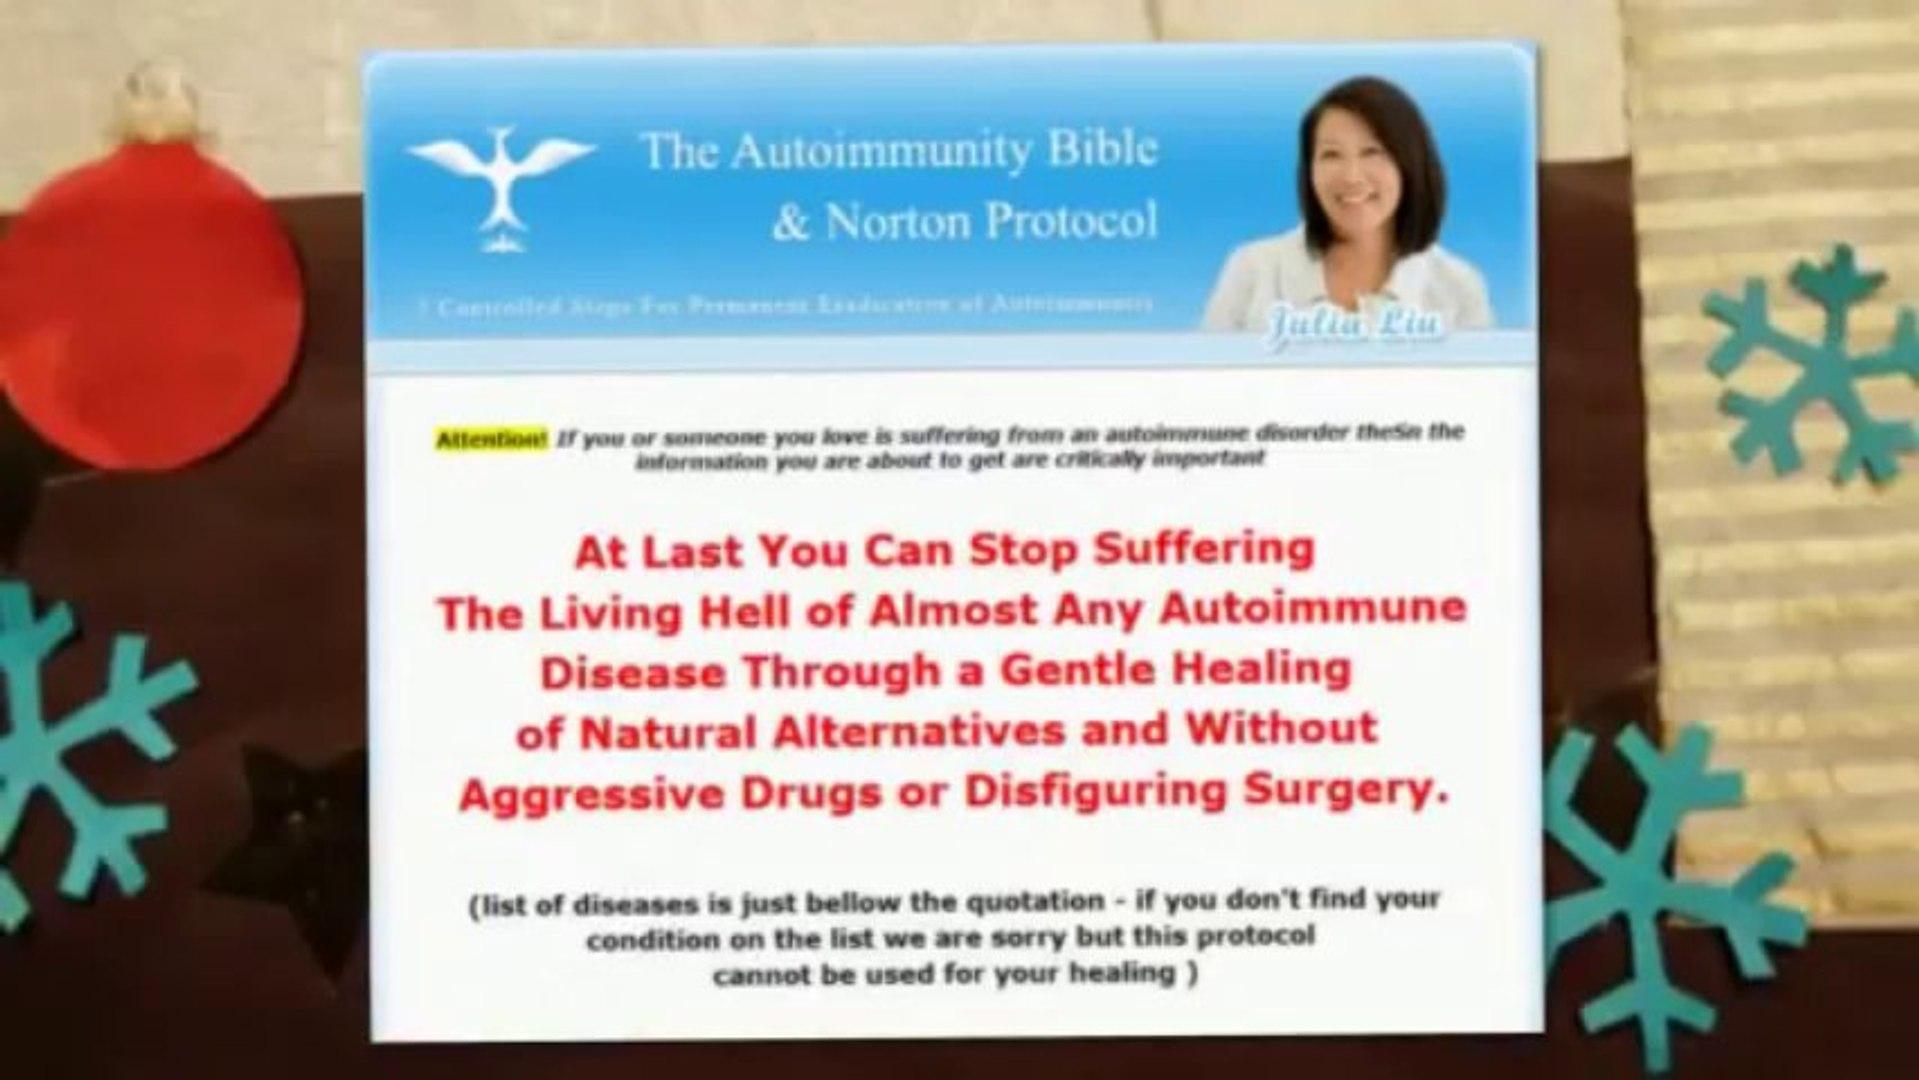 autoimmunity bible autoimmunity bible & norton protocol